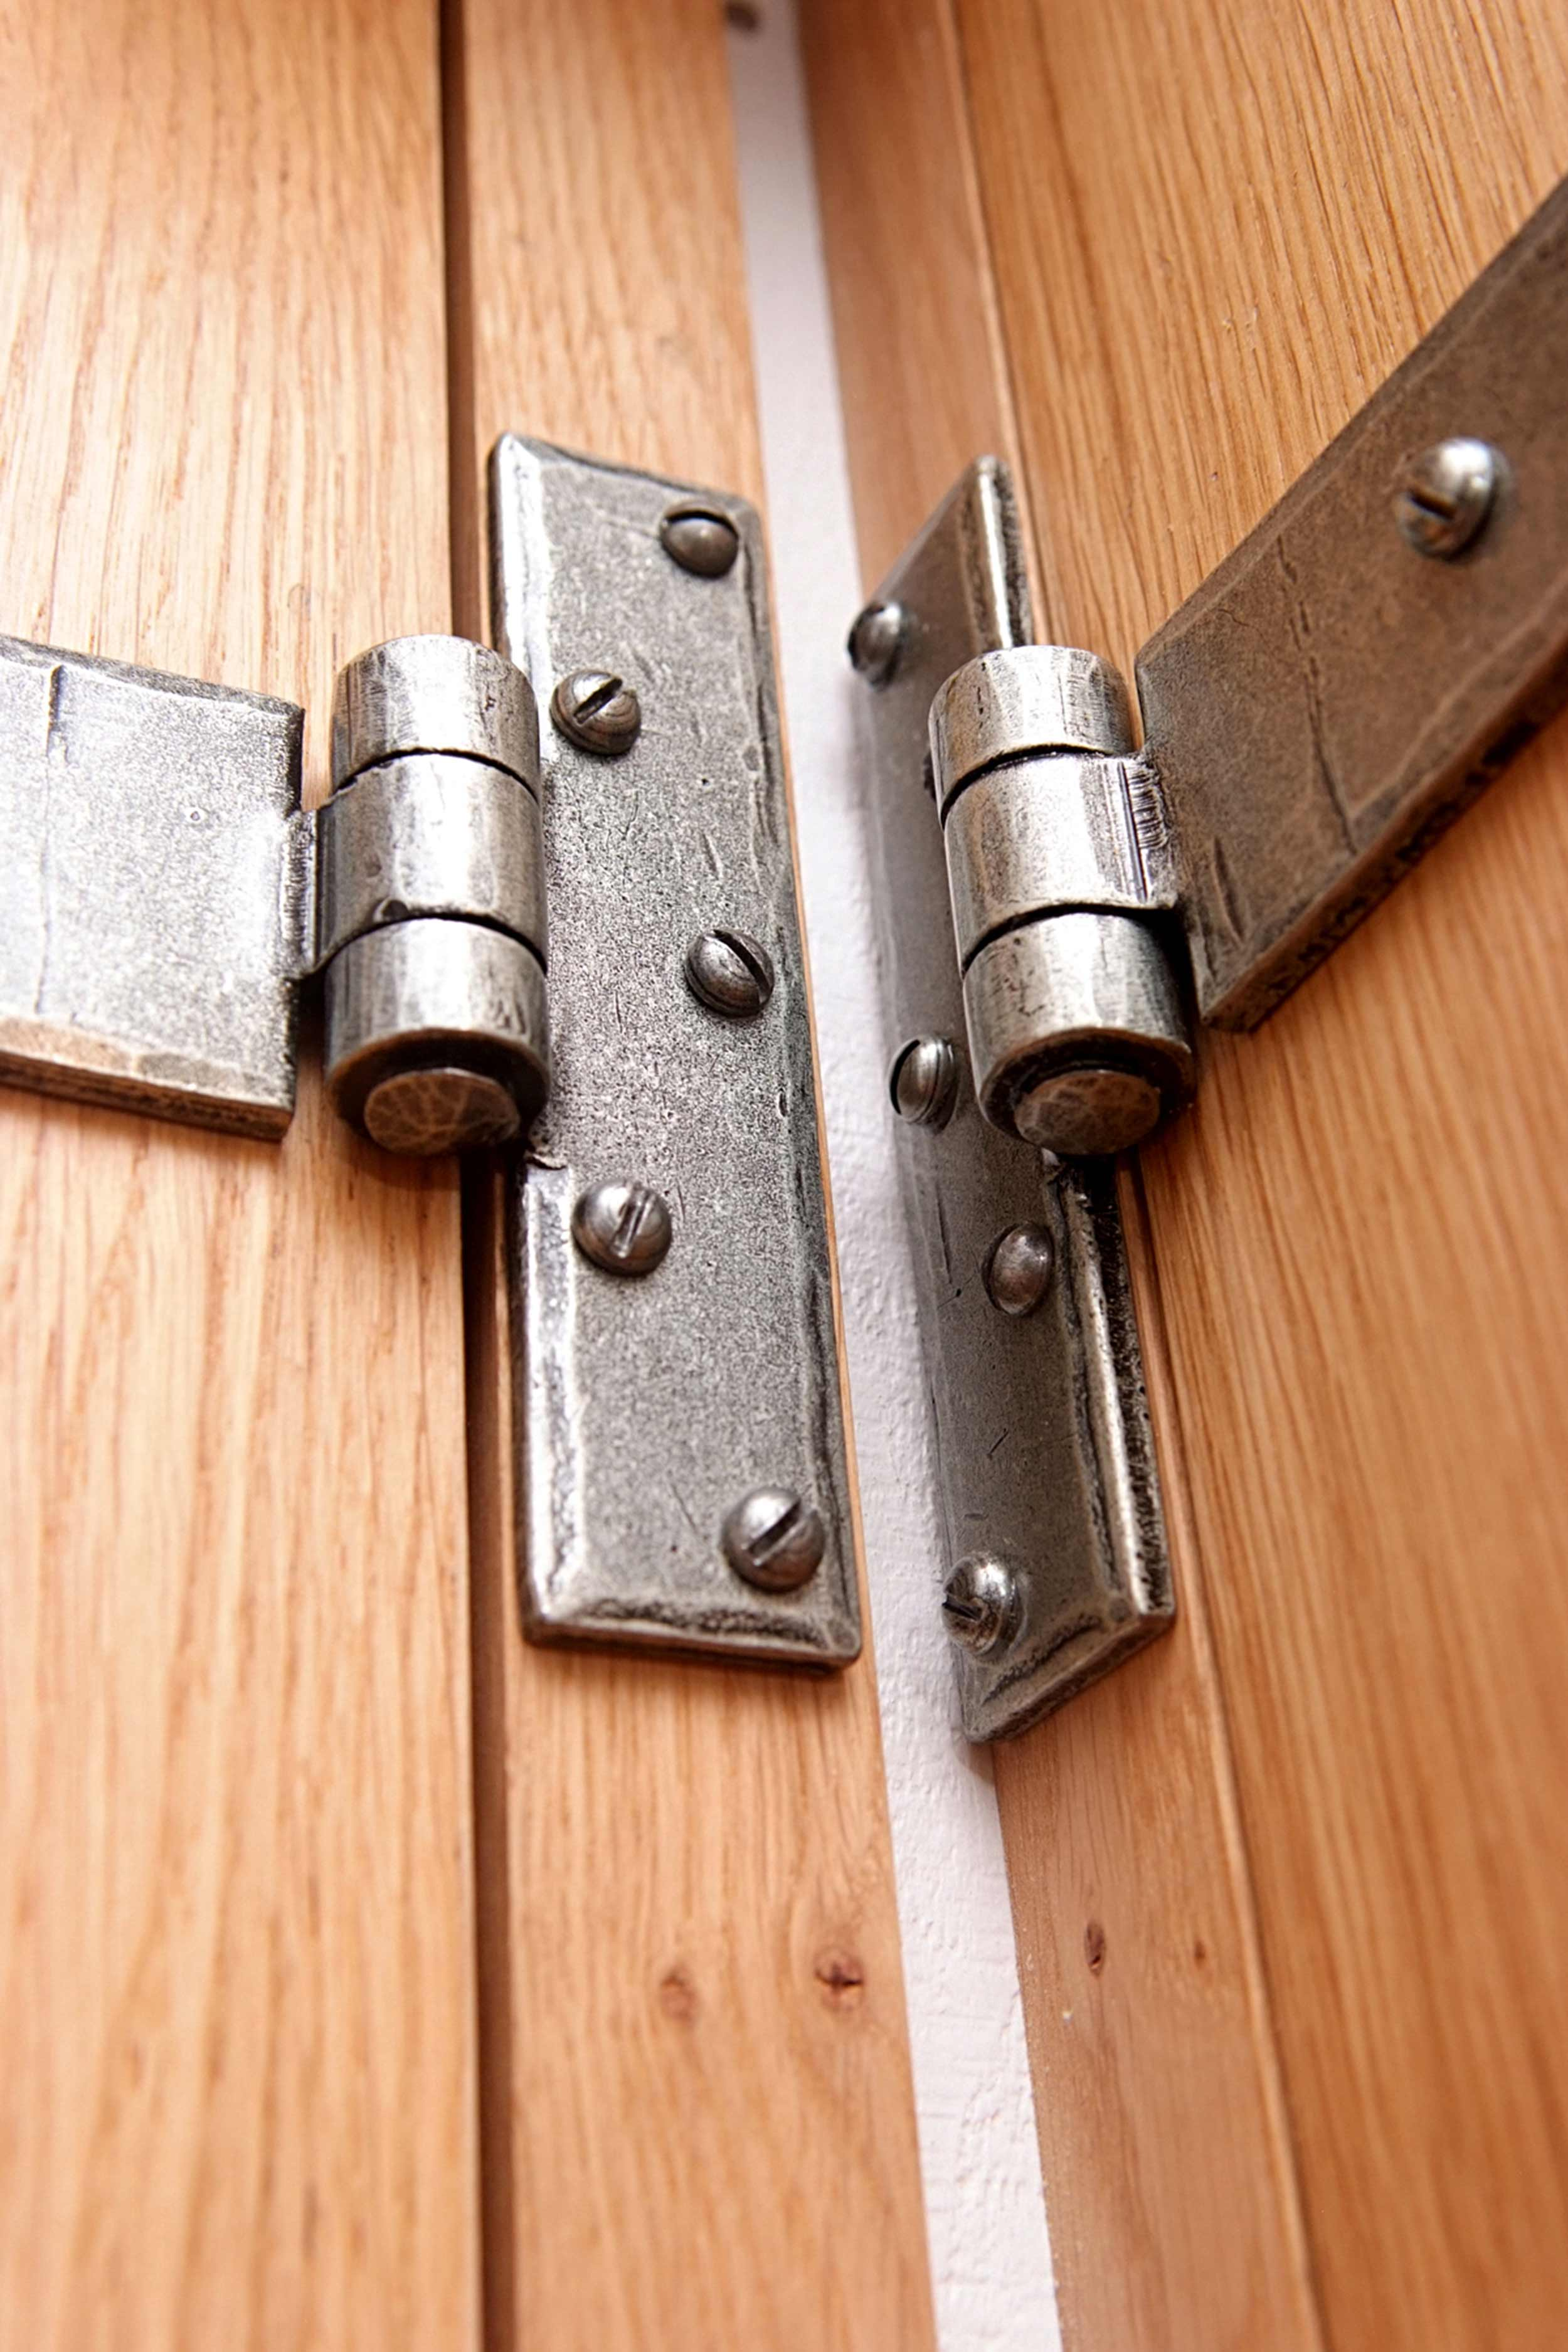 Shepherds Hut Forged Iron Door Hinge Details